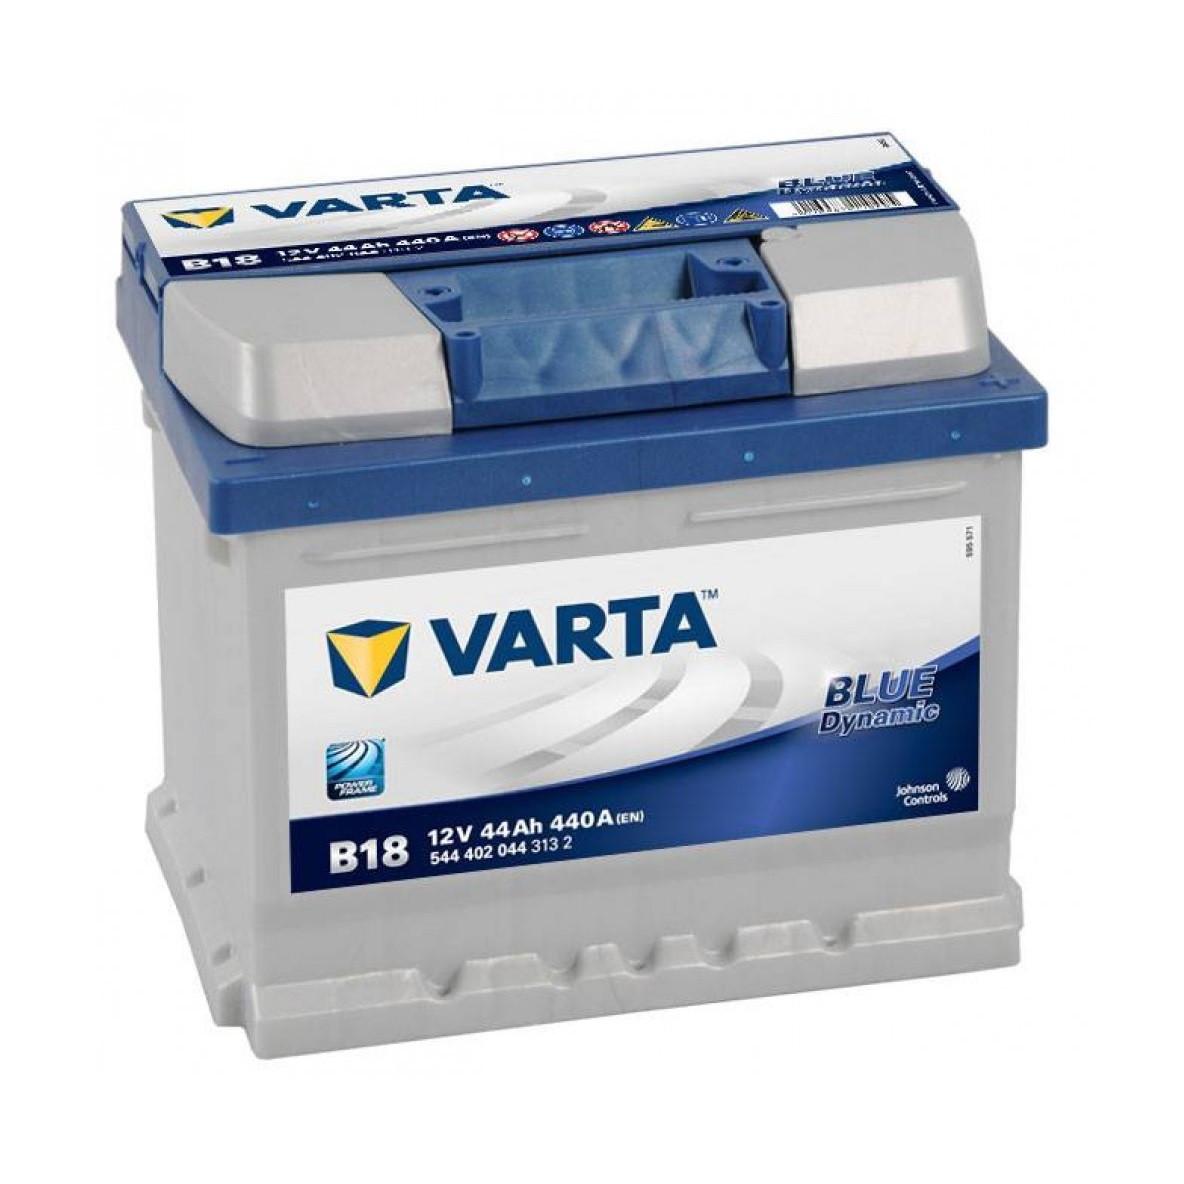 Акумулятор VARTA 44Ач Blue Dynamic B18 (544402044)